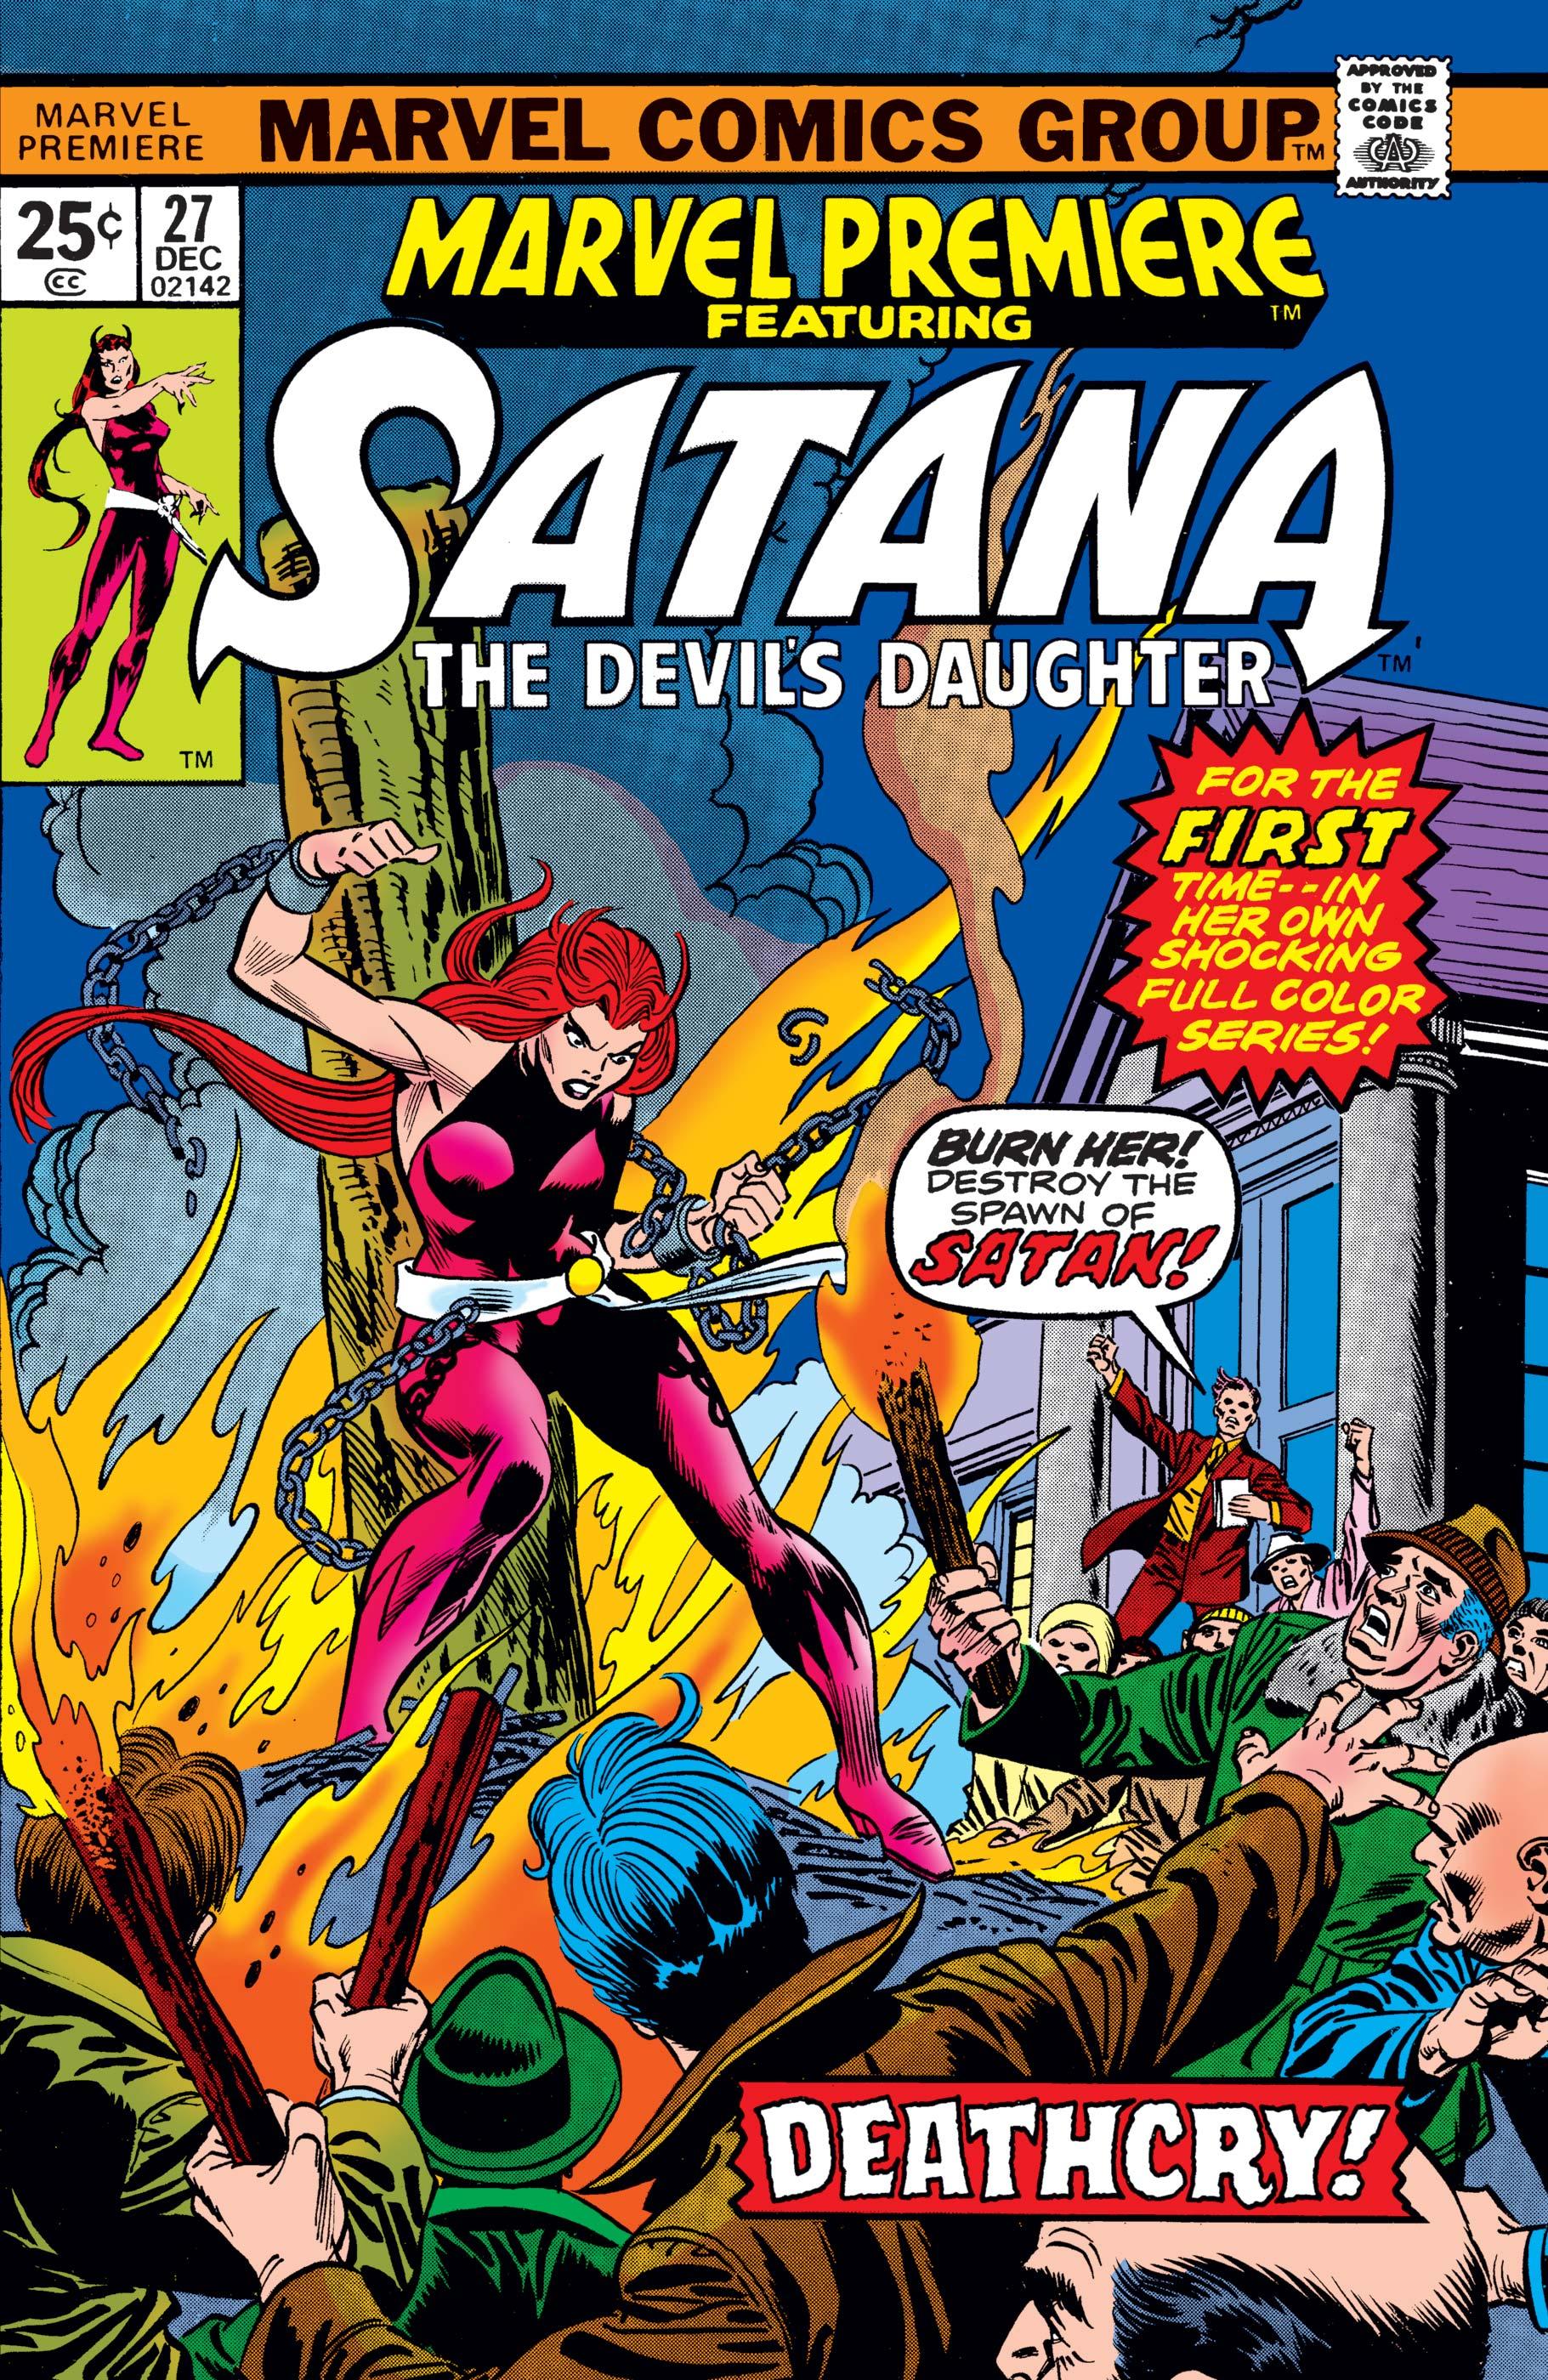 Marvel Premiere (1972) #27